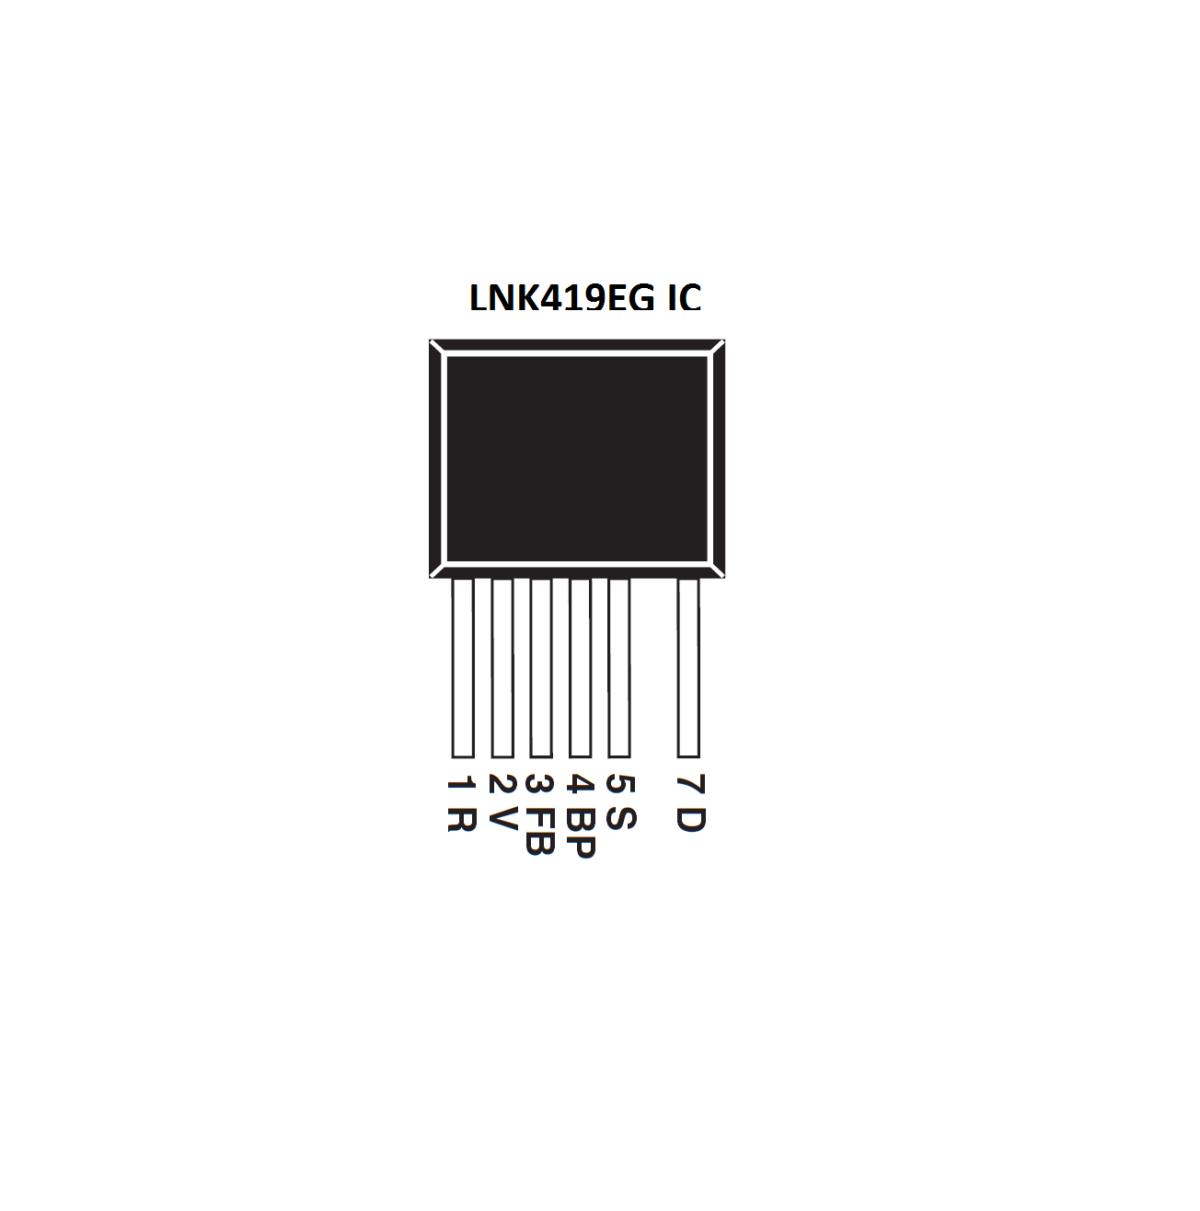 LNK419EG IC-Power Integrations-LED Driver Off Line Switcher IC